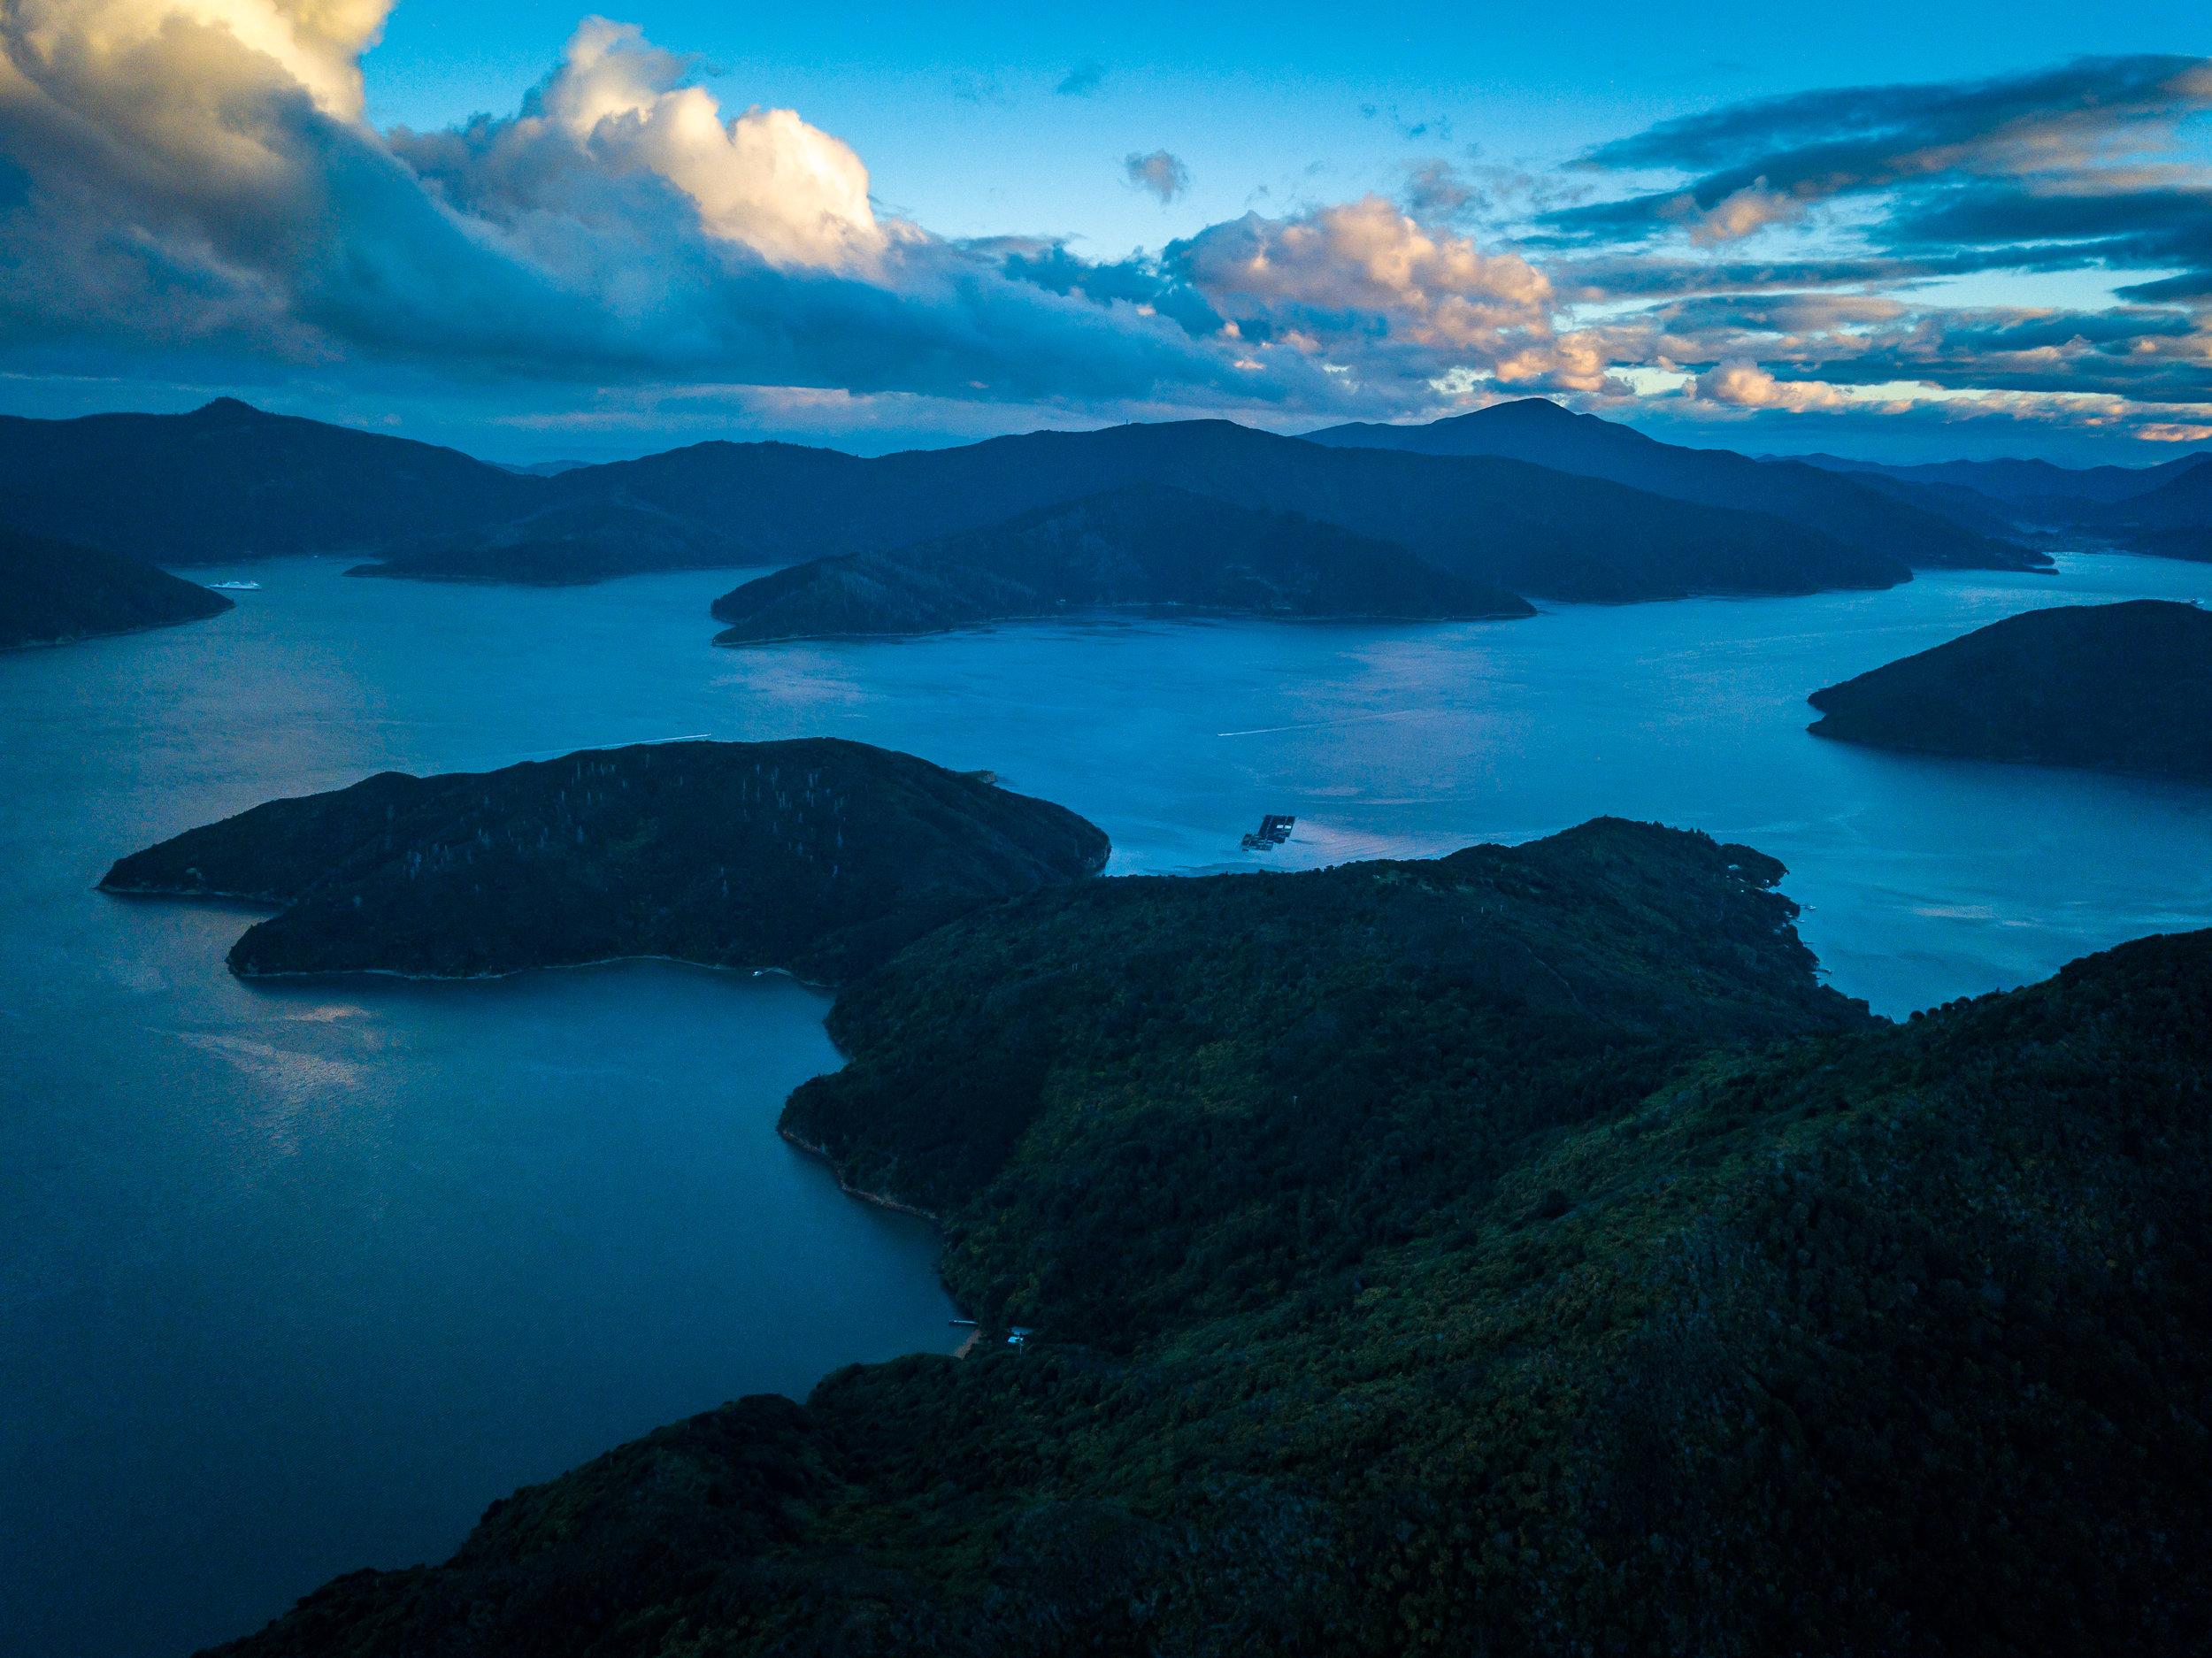 Bay of Many Coves - Marlborough Sounds, New Zealand